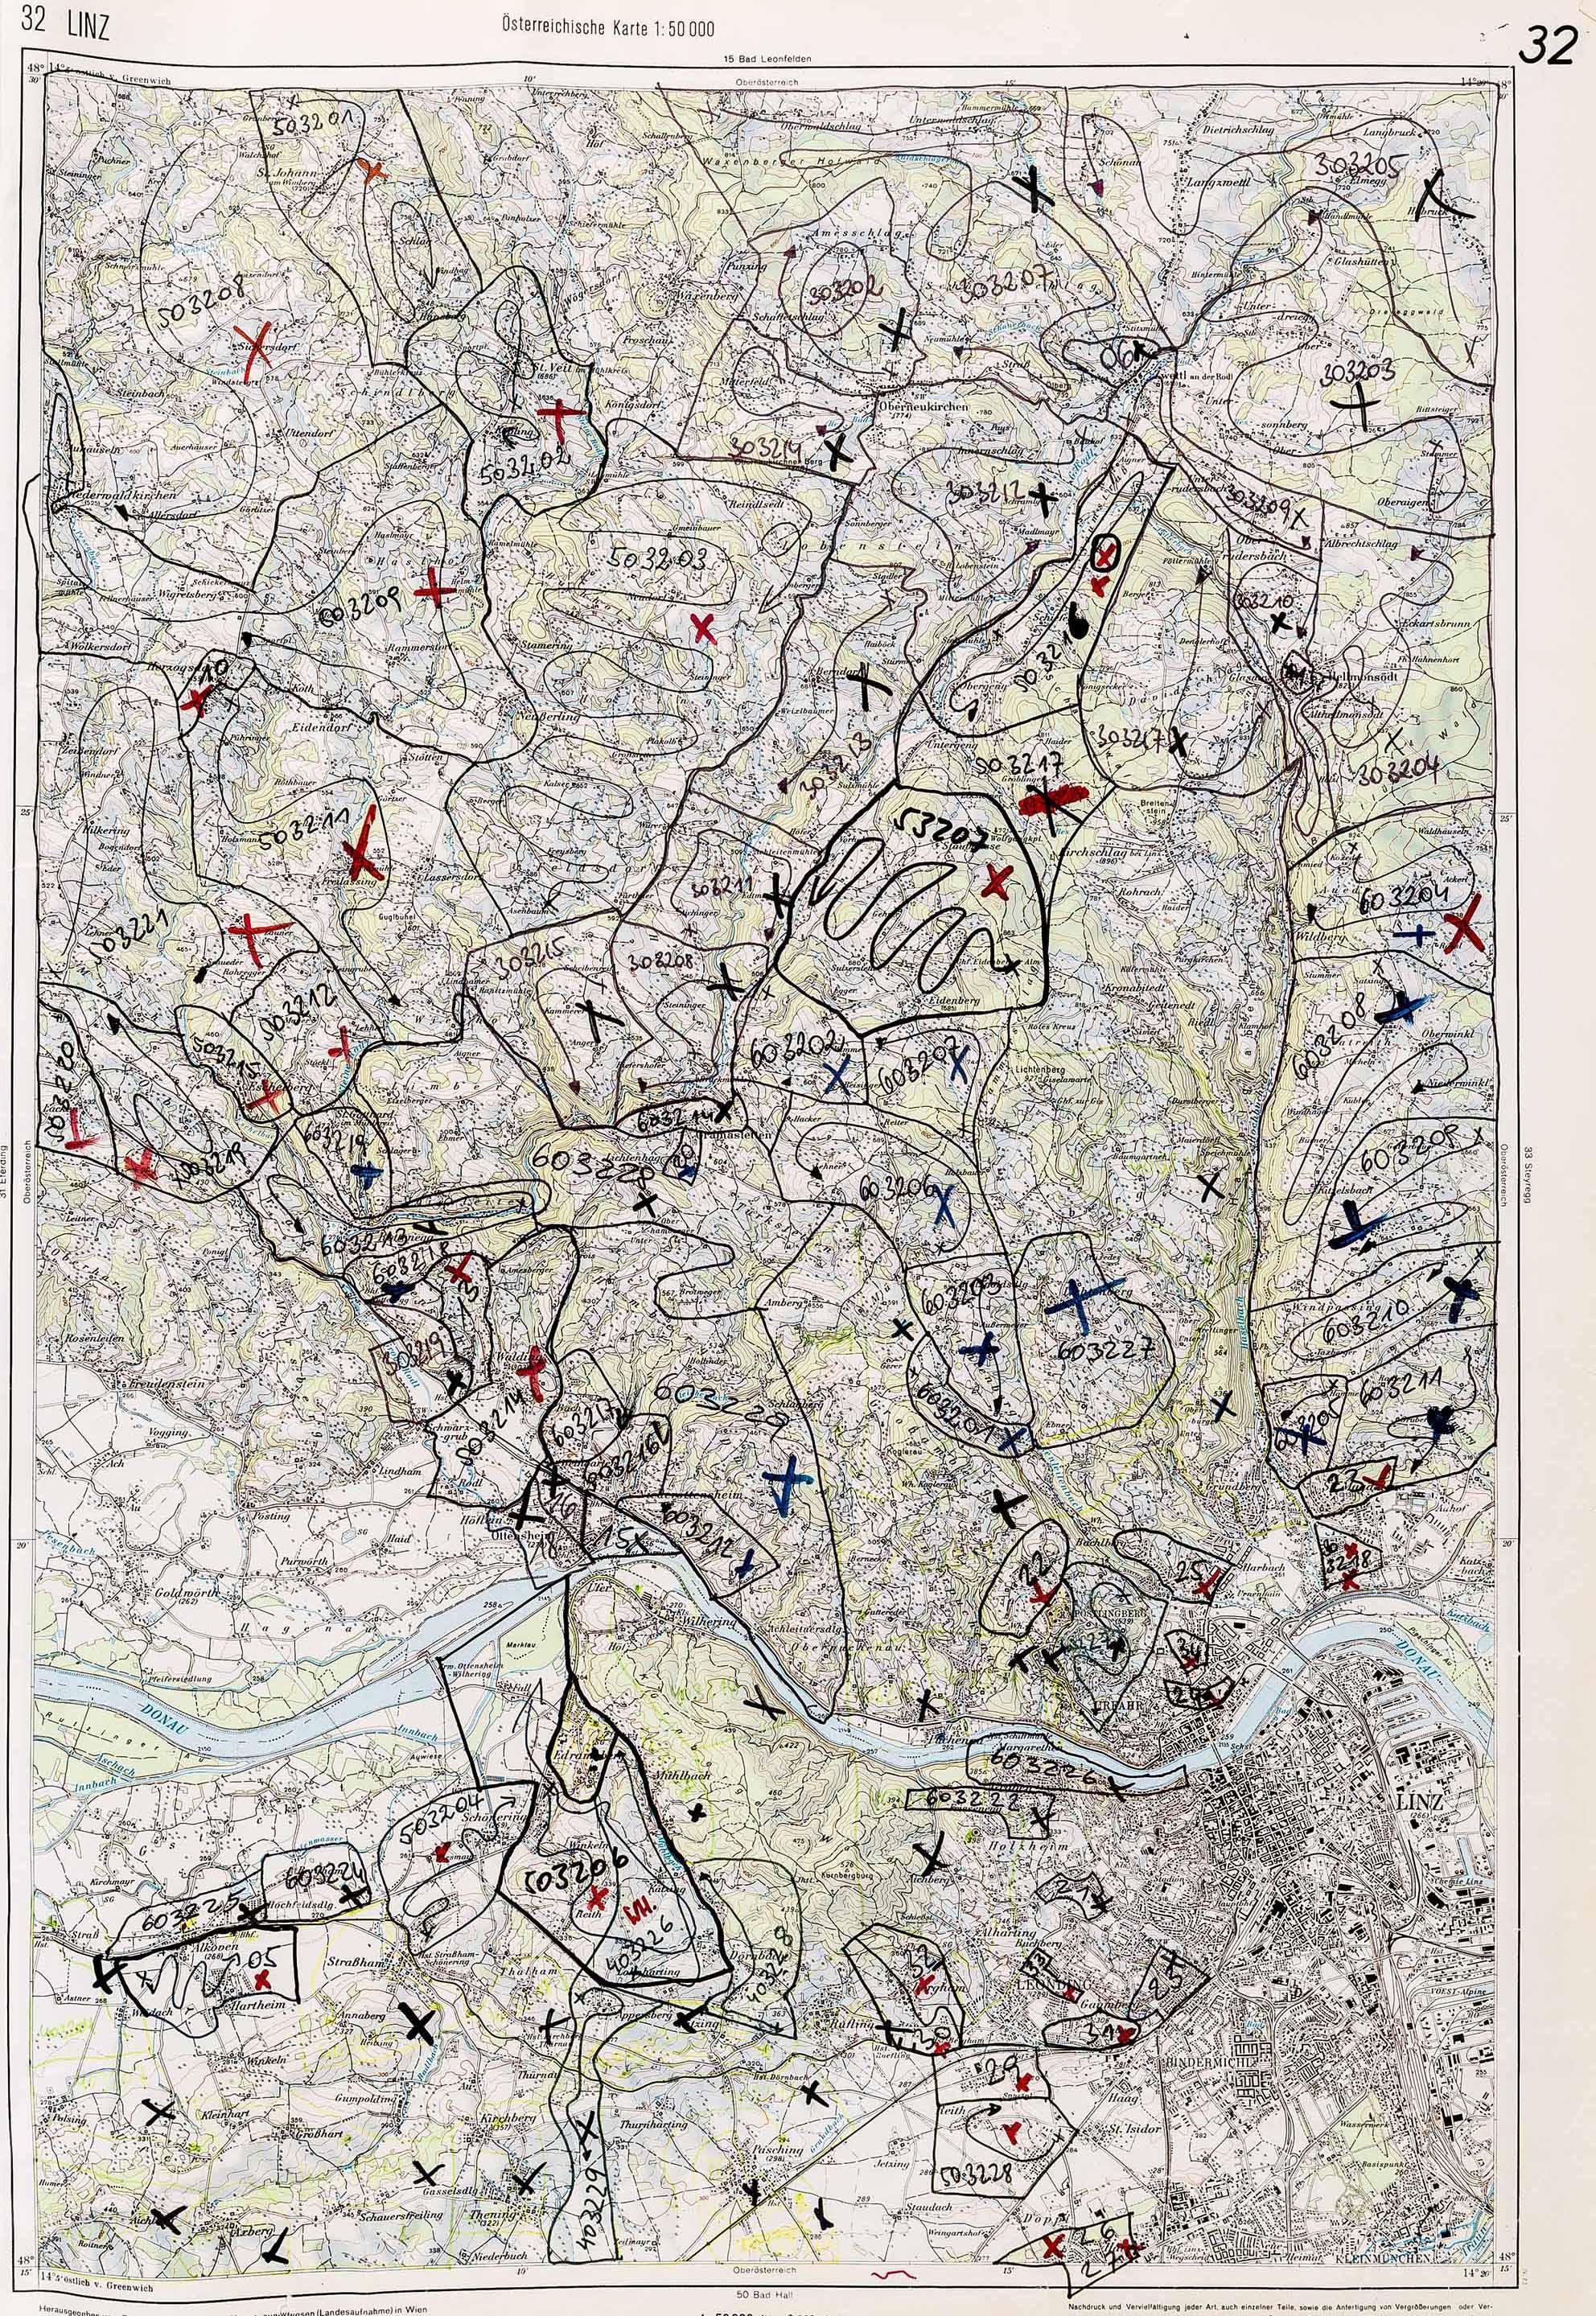 1983-1986 Karte 032